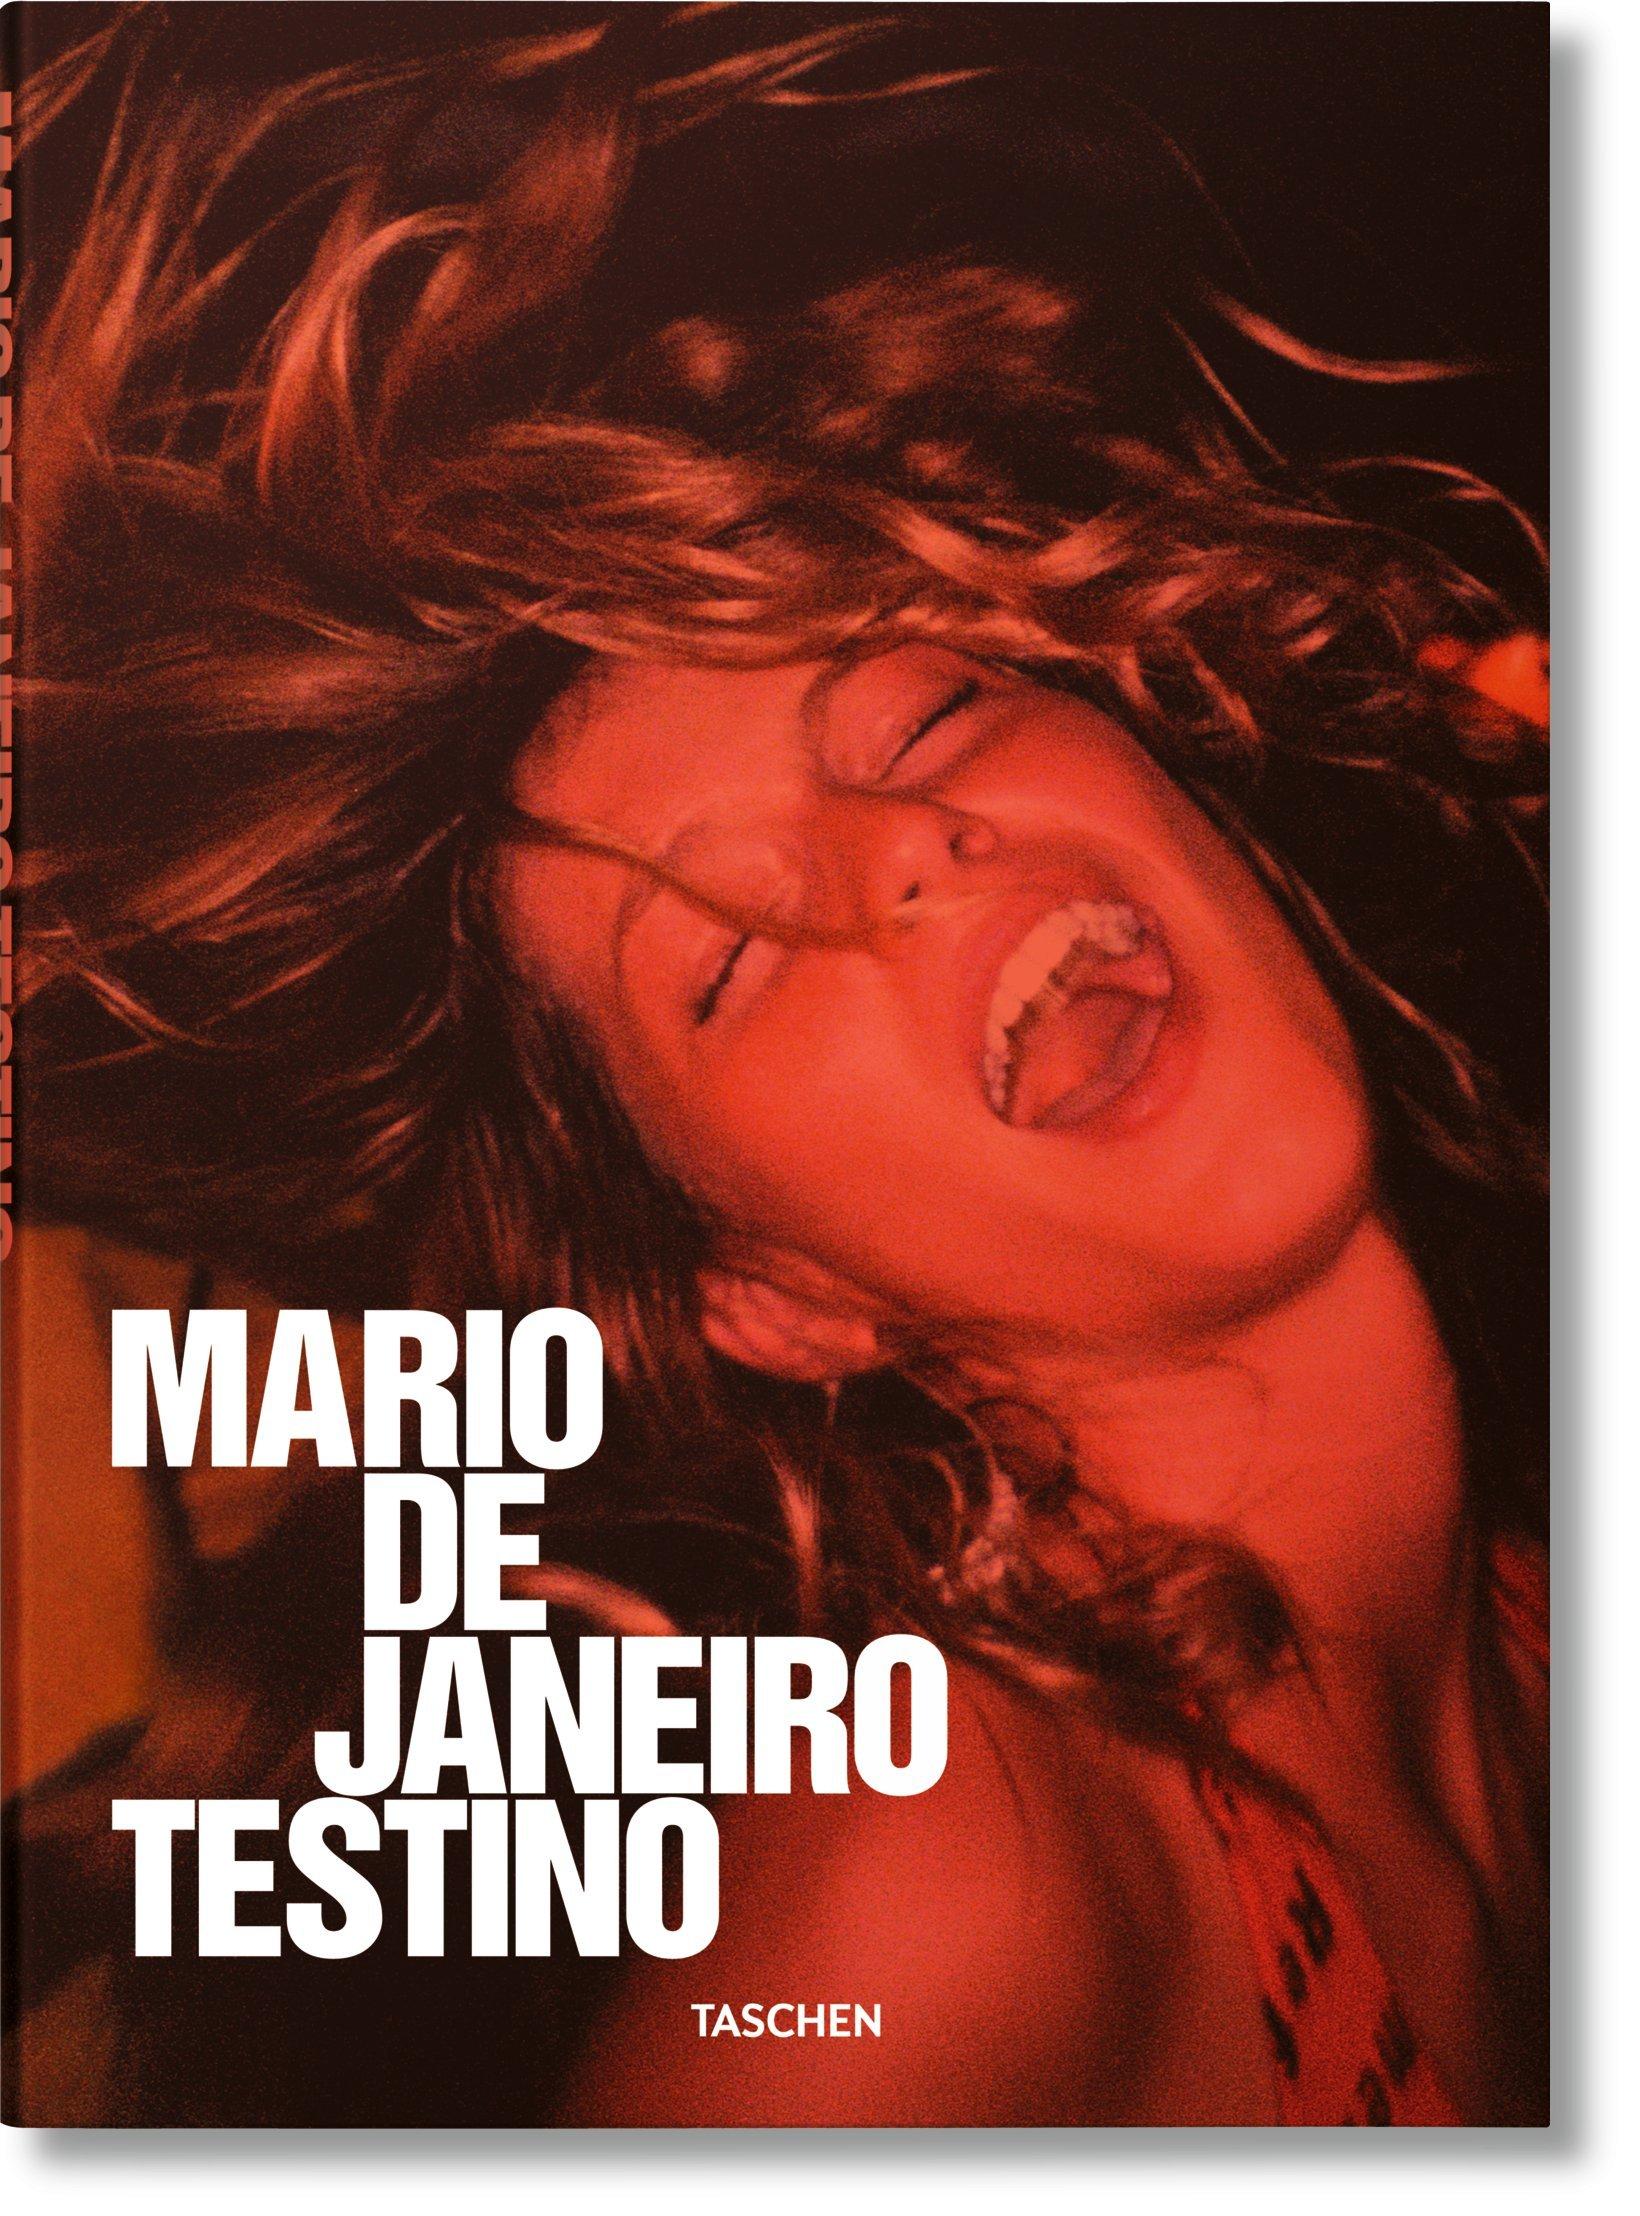 Rio de Janeiro. Ediz. italiana, spagnola e portoghese (Spagnolo) Copertina flessibile – 1 set 2009 Mario Testino Taschen 3836519097 Brasile